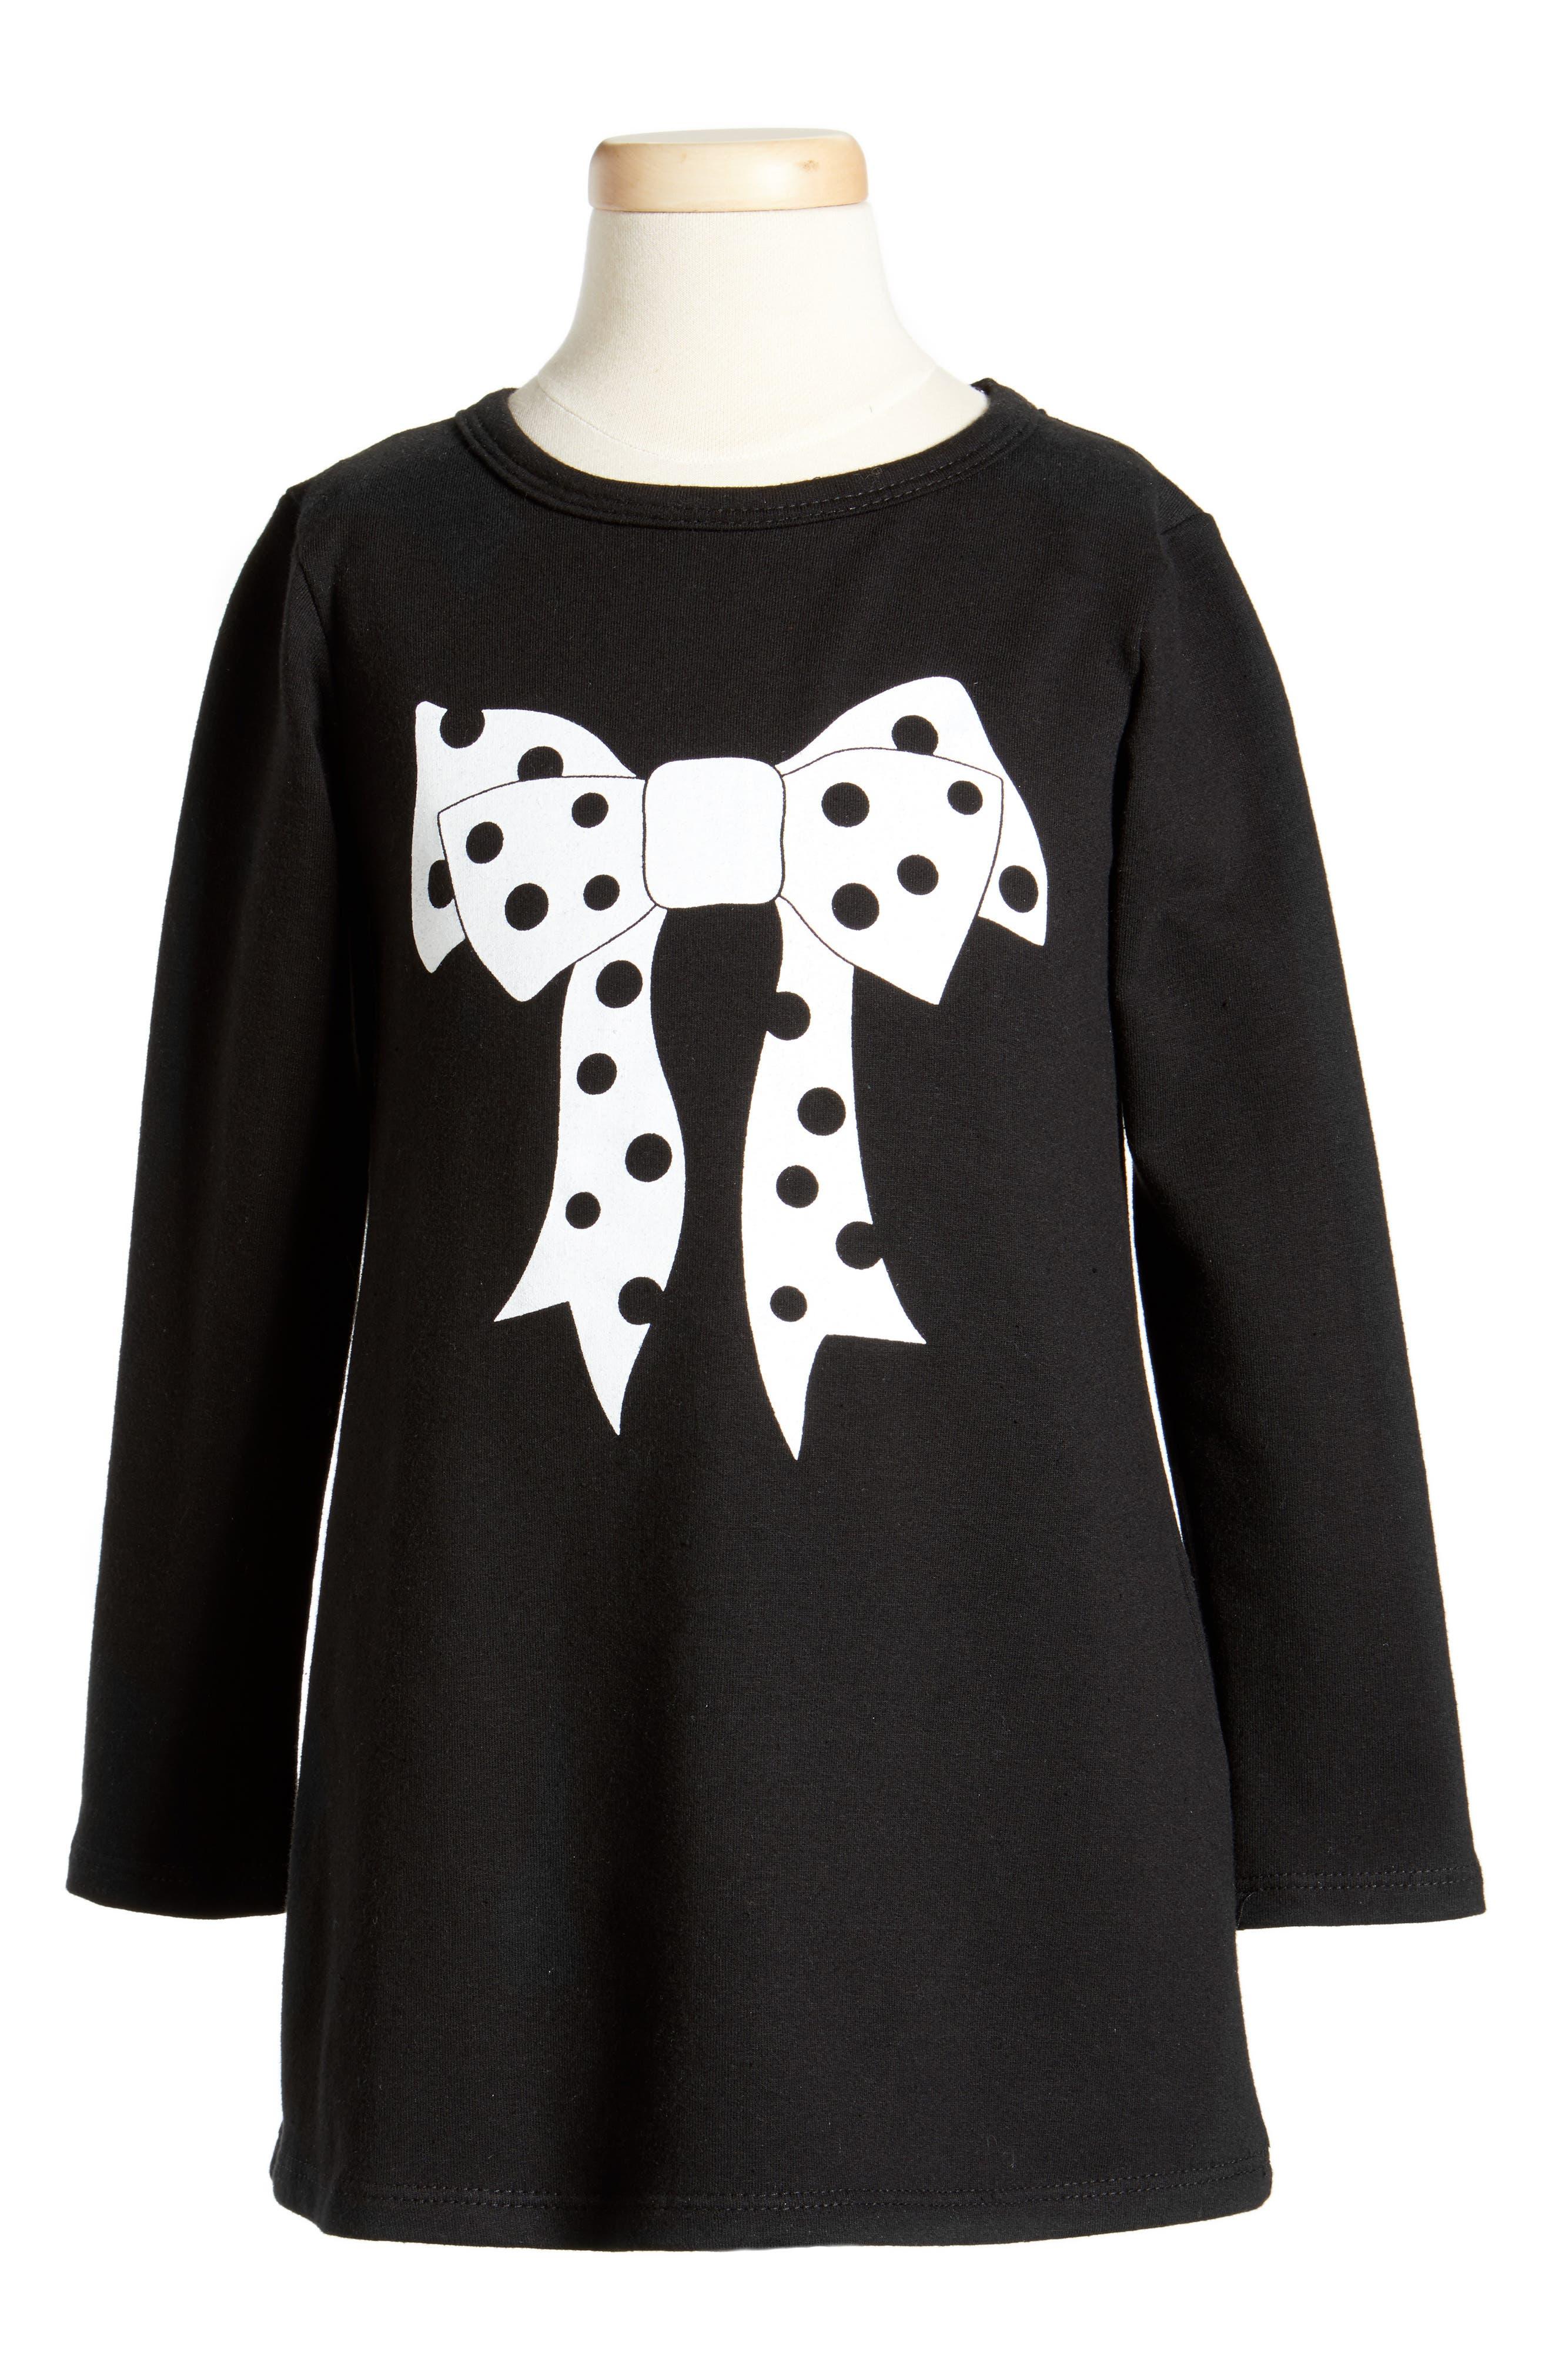 Main Image - Cotton Emporium Bow Dress (Toddler Girls, Little Girls & Big Girls)